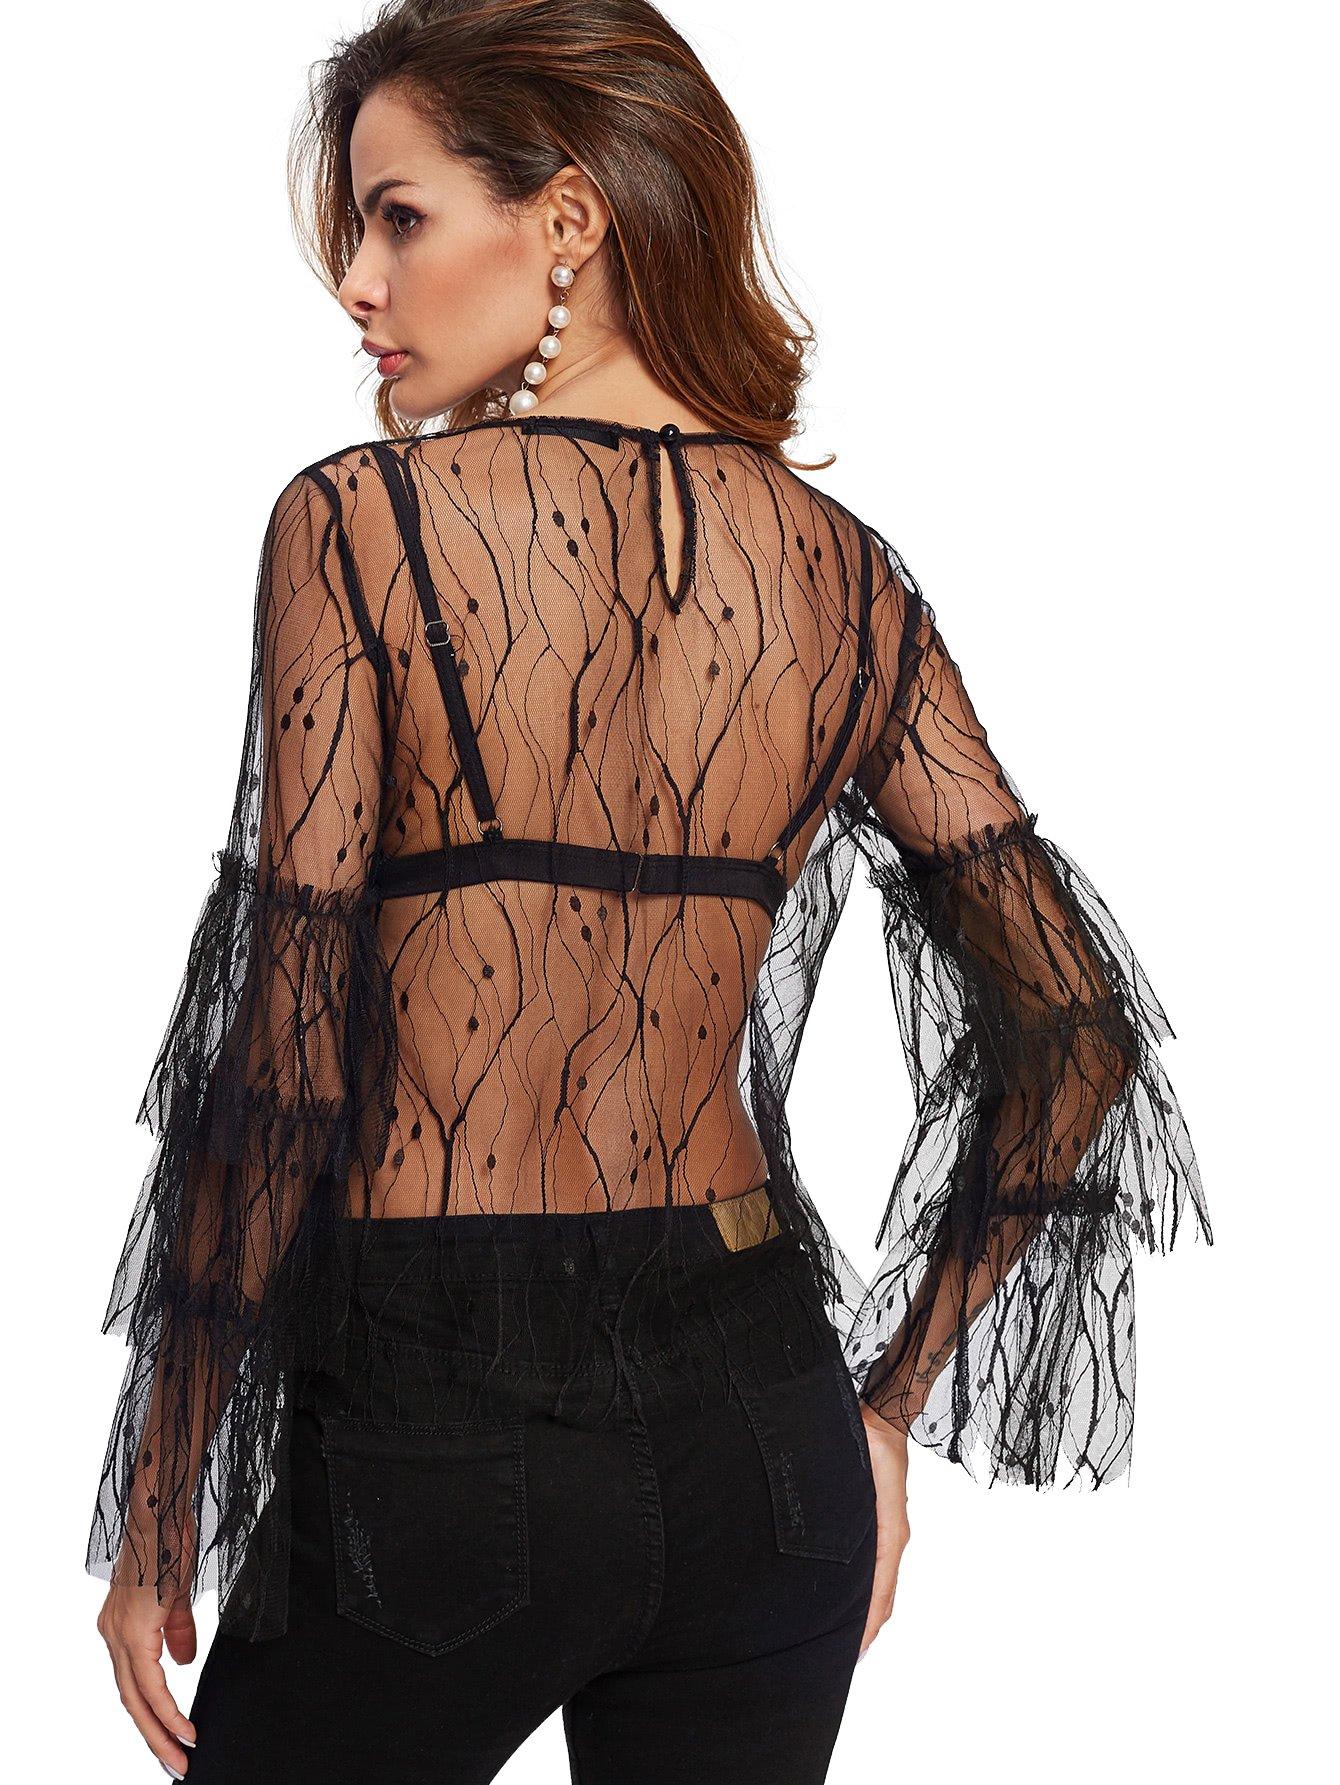 ecd2f83a48 WDIRA Women's Sexy See Through Ruffle Sleeve Mesh Tops T Shirts Black L